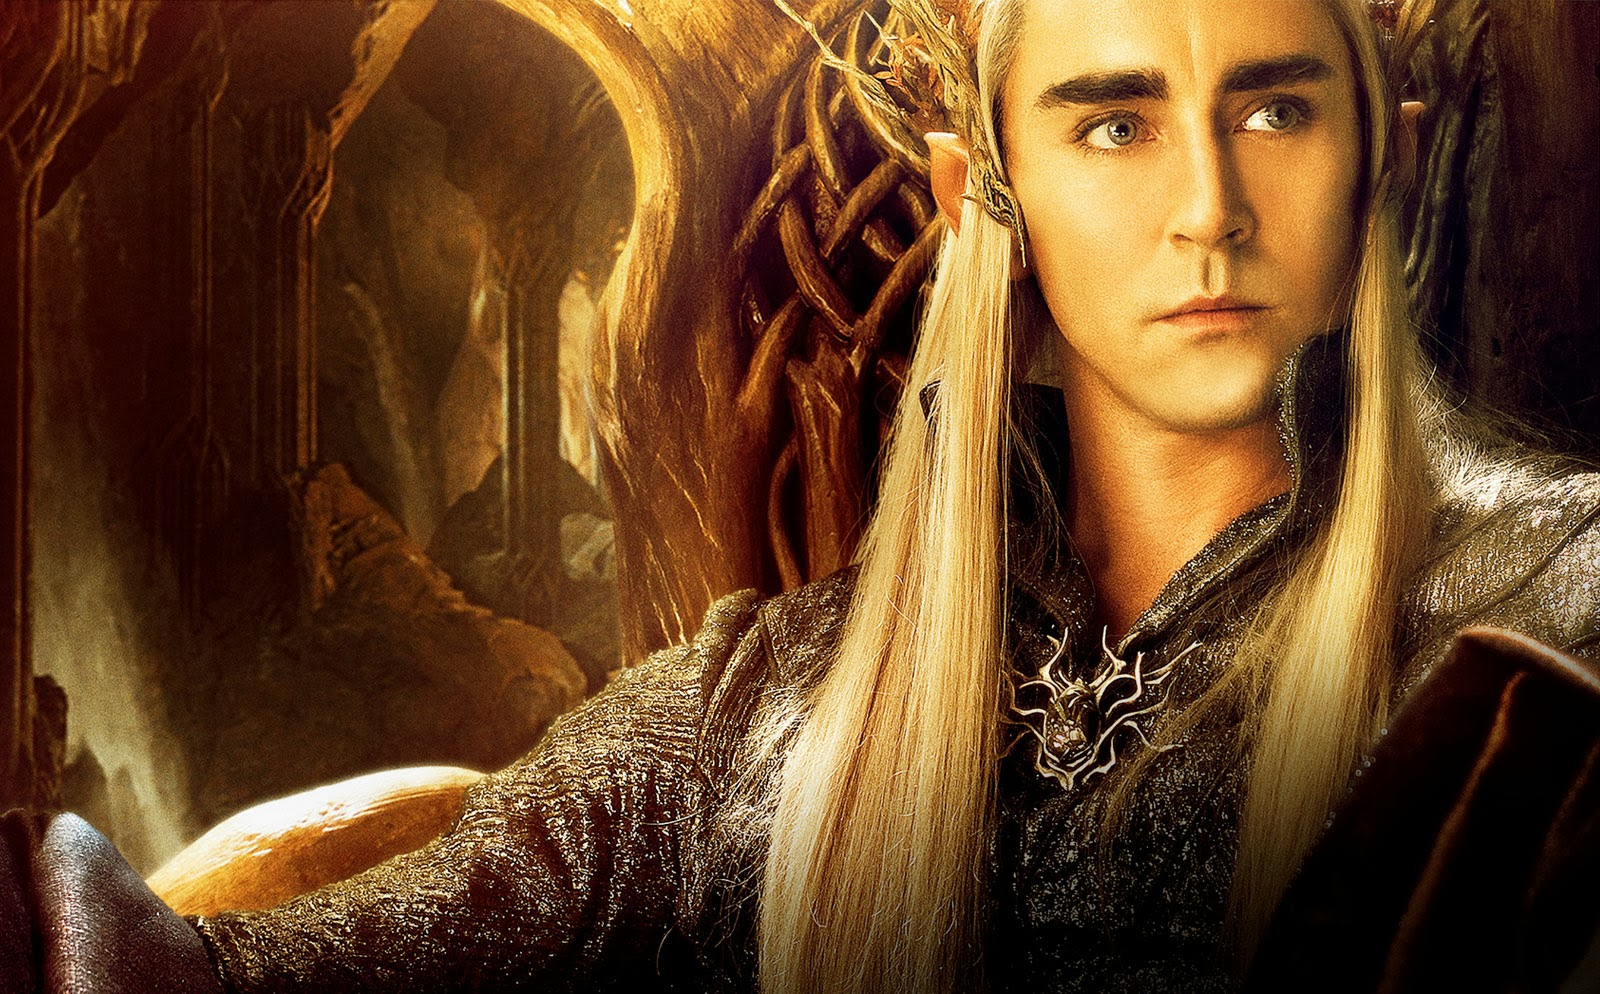 King Of The Elves Movie Wallpaper Wallpaper   WallpaperMine.com